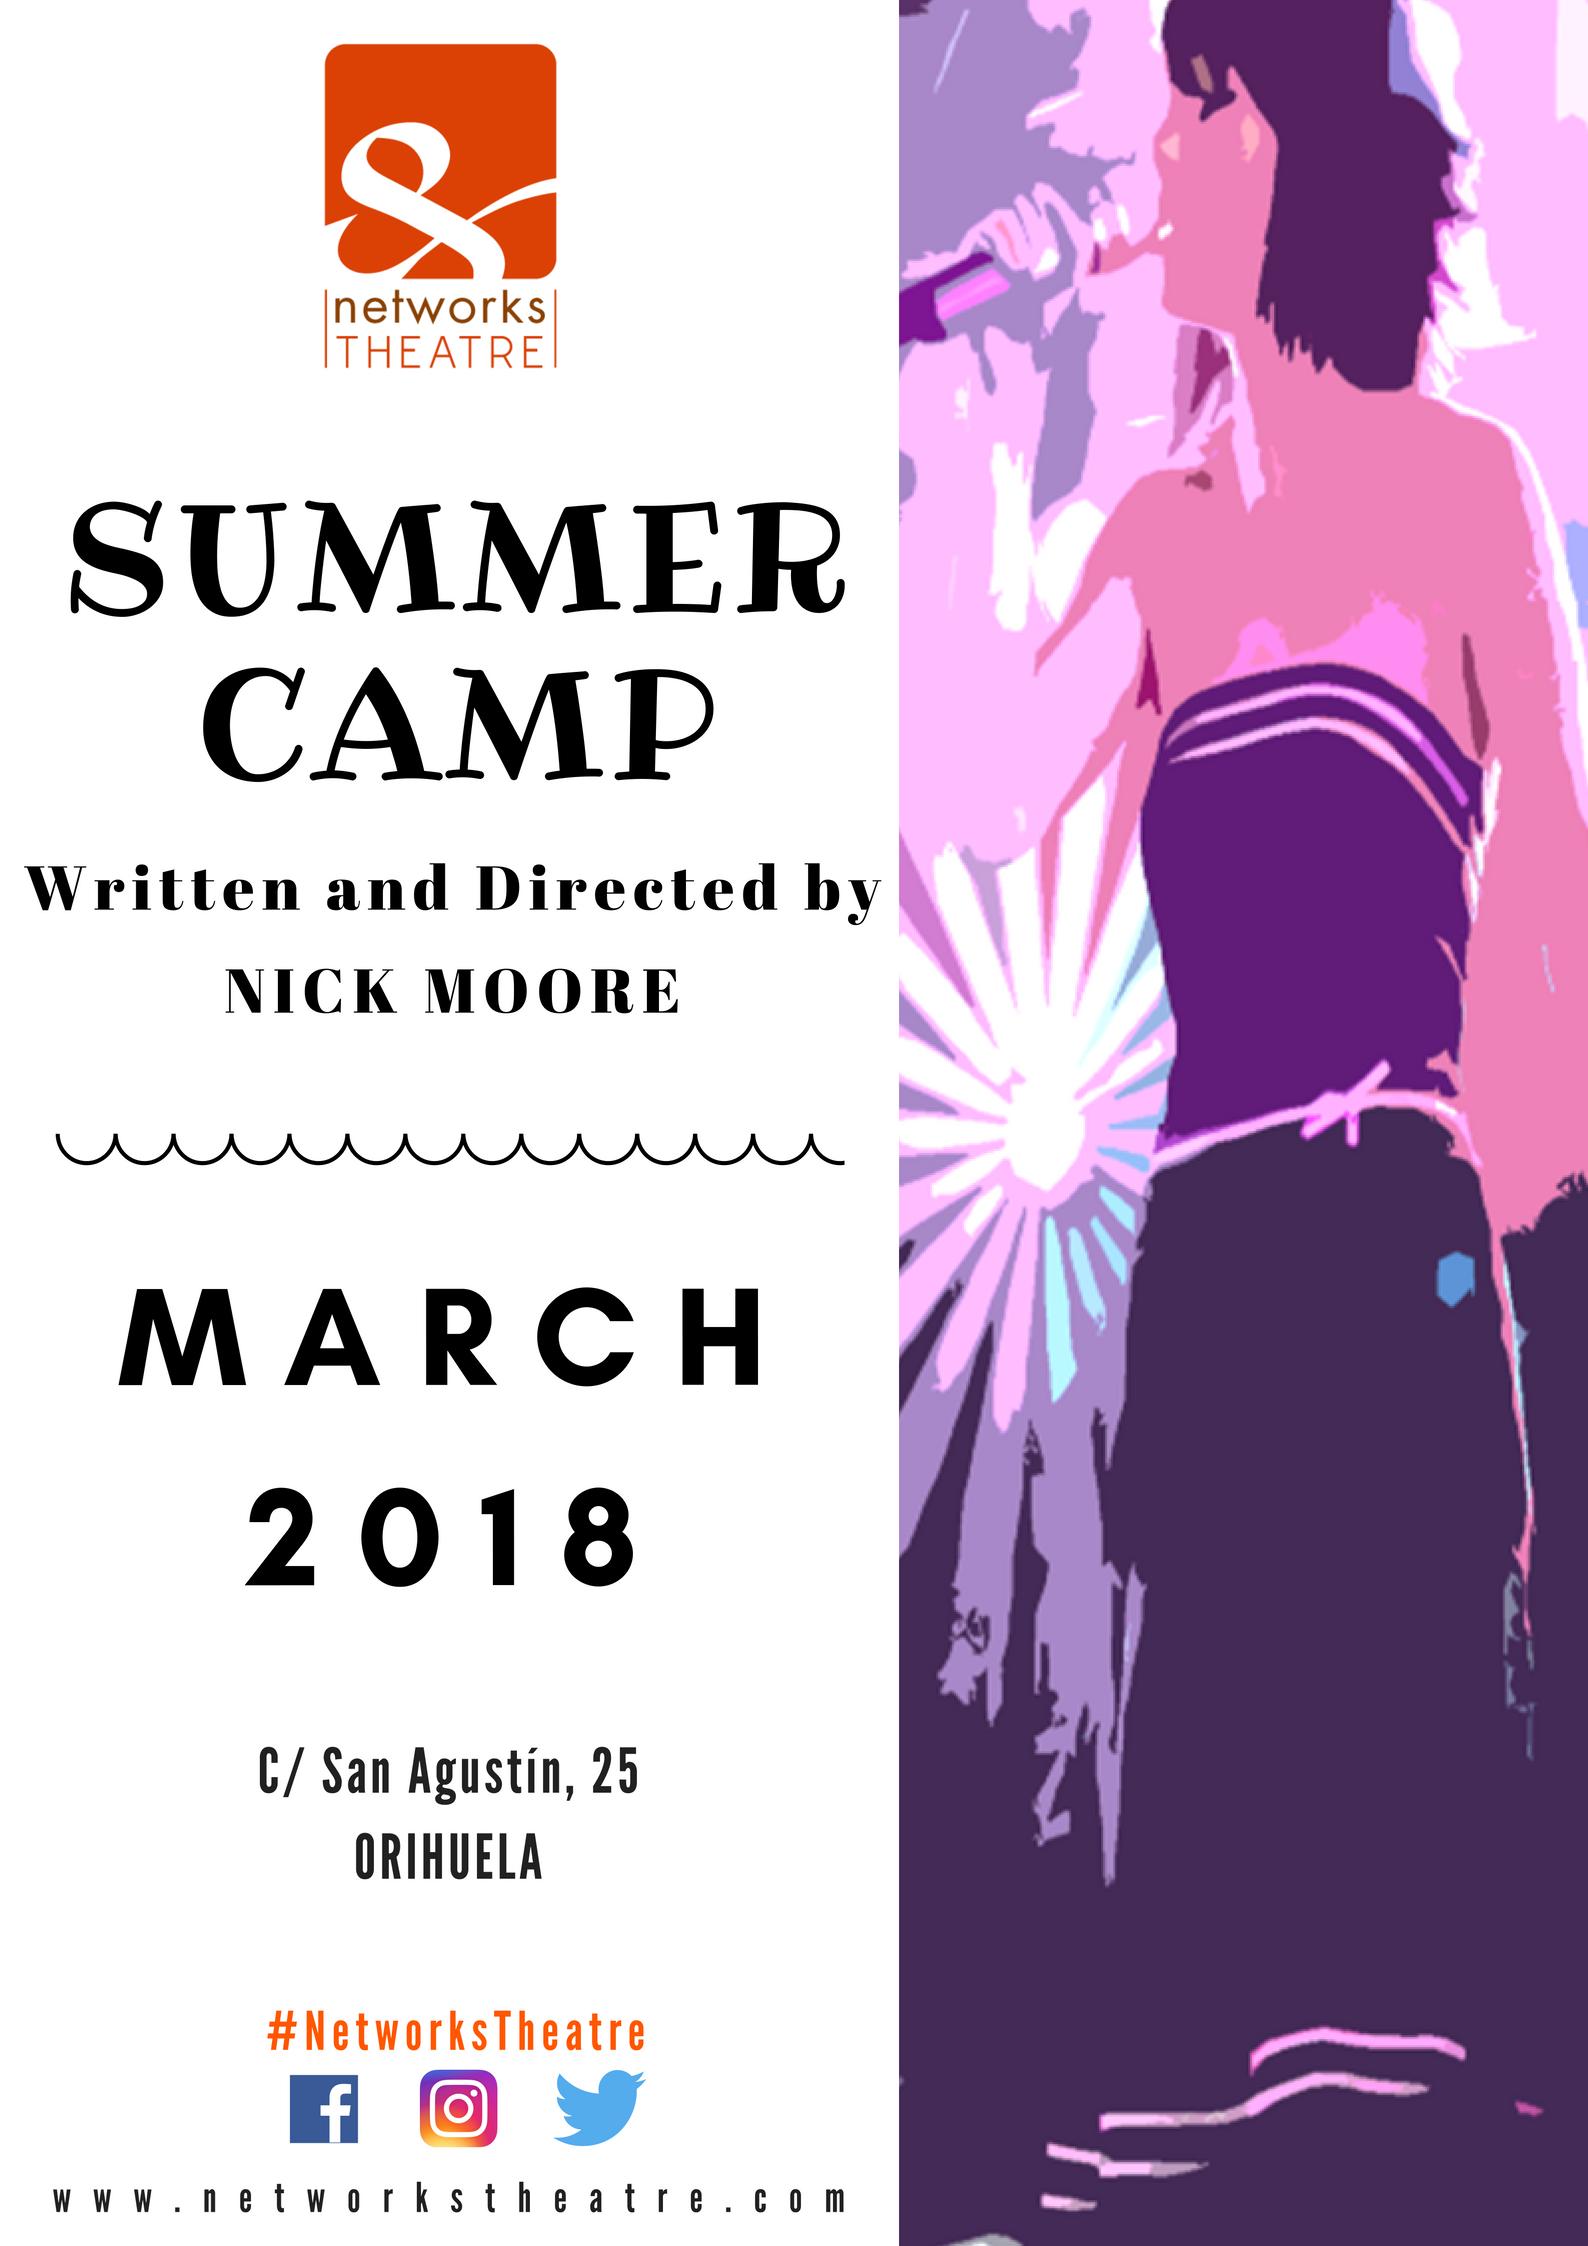 Summer Camp in Orihuela